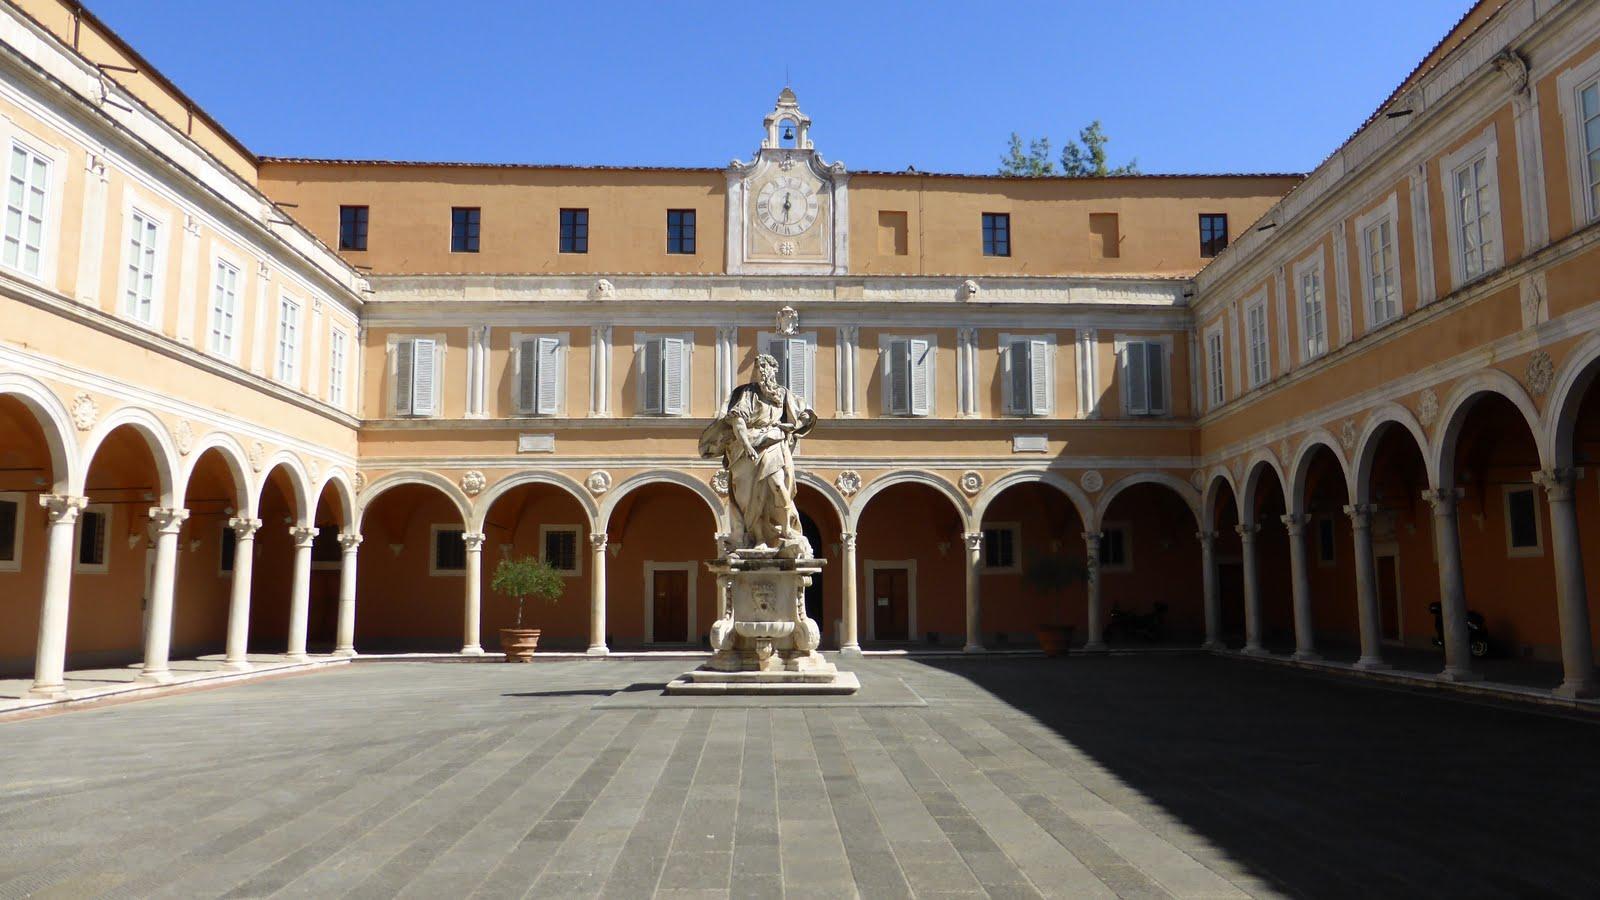 Piazza dei Cavalieri